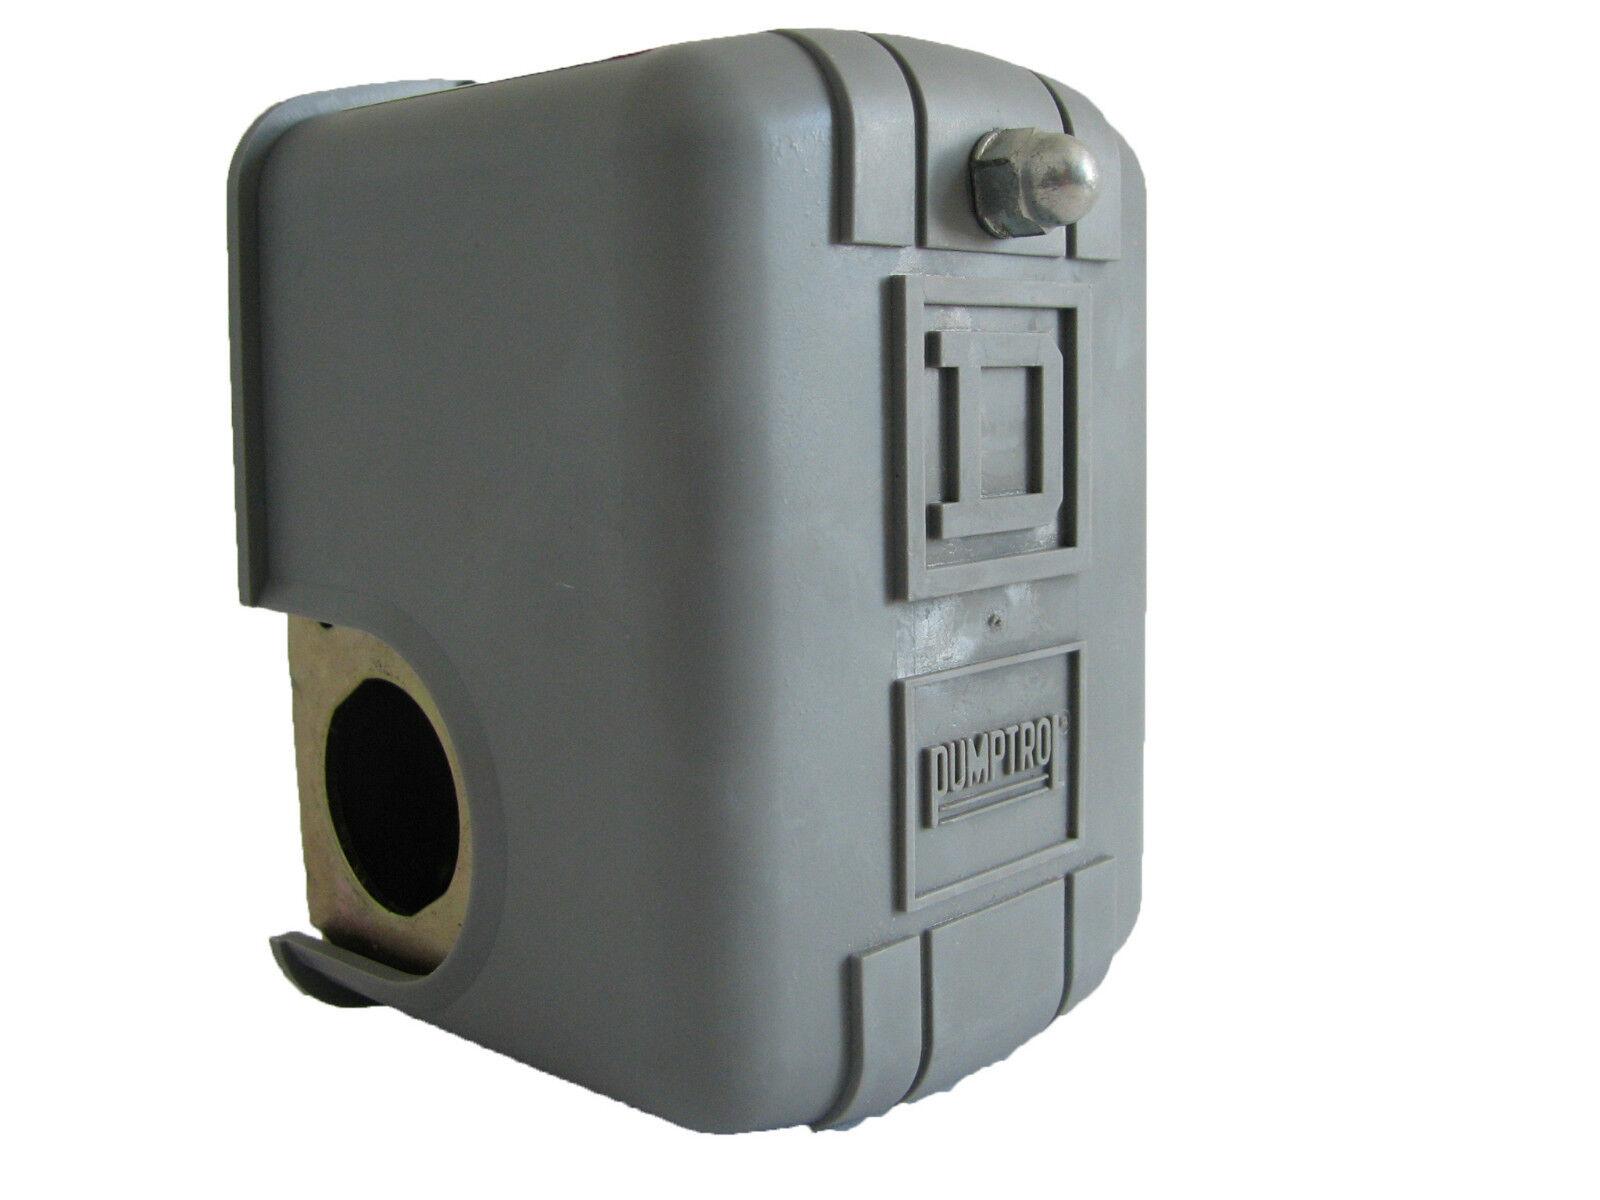 Download Free Flotec Pressure Switch 40 60 Manual